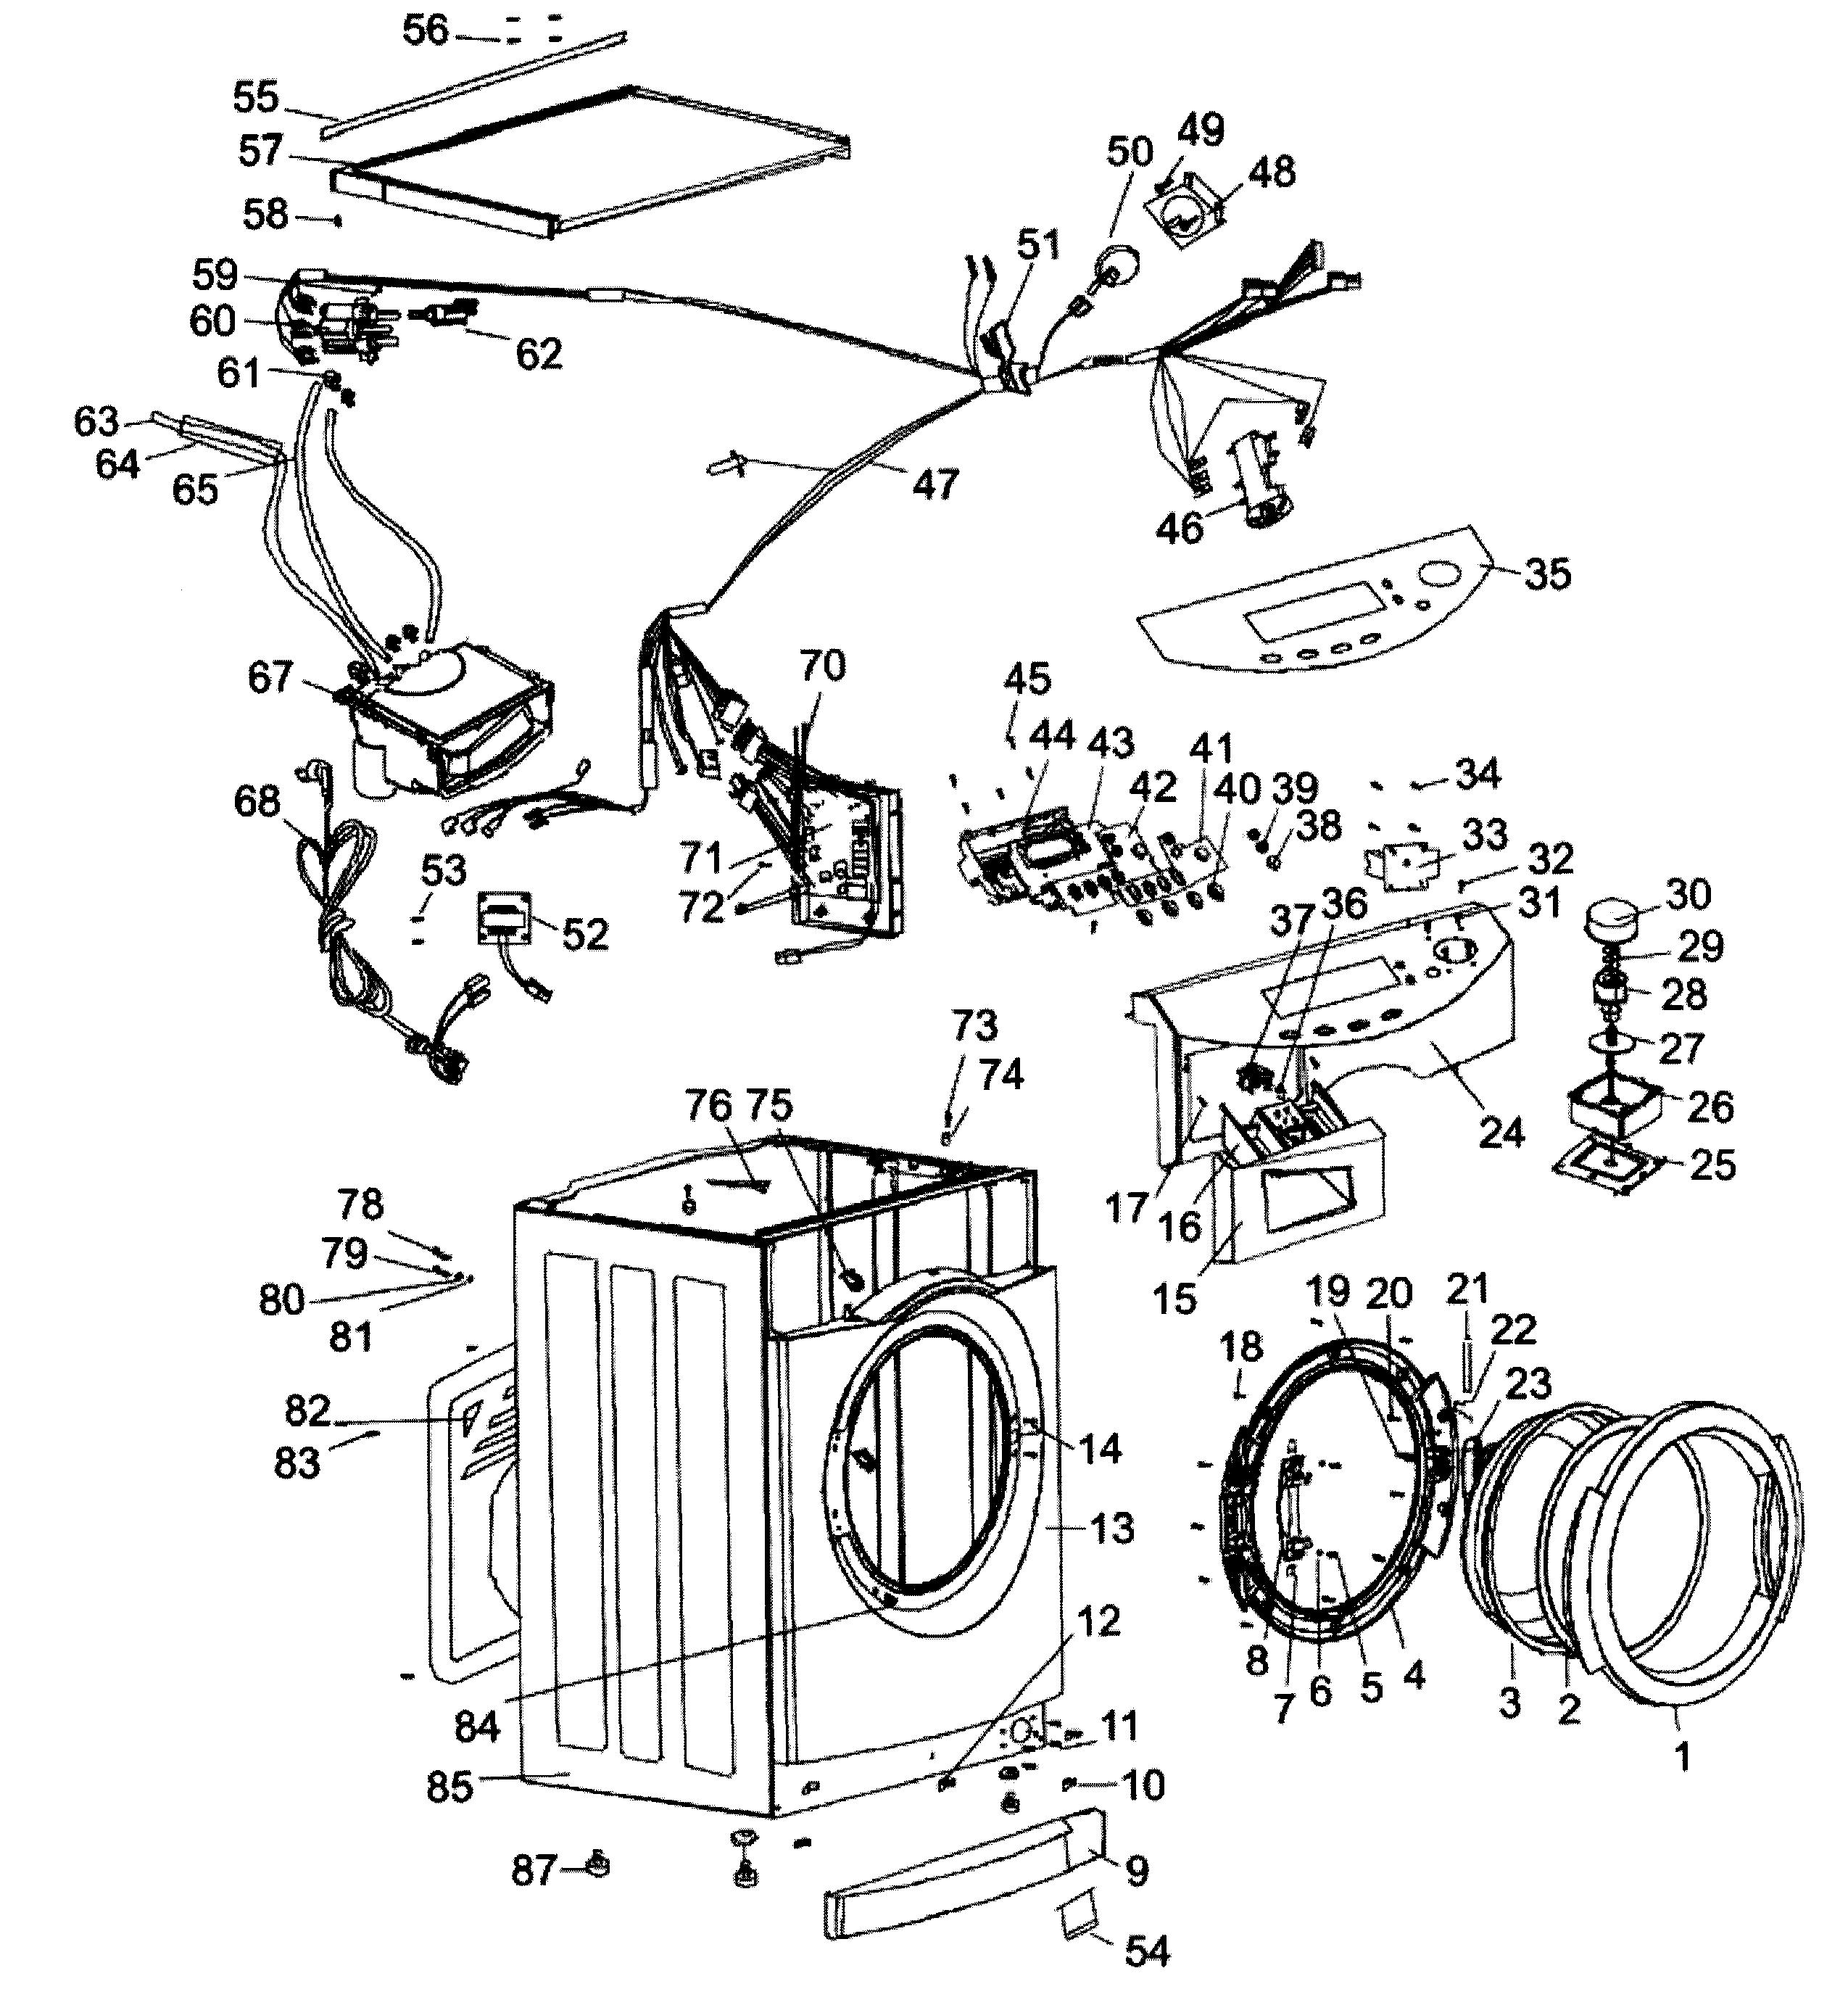 Haier Washer/dryer Parts Washer and dryer, Washer dryer